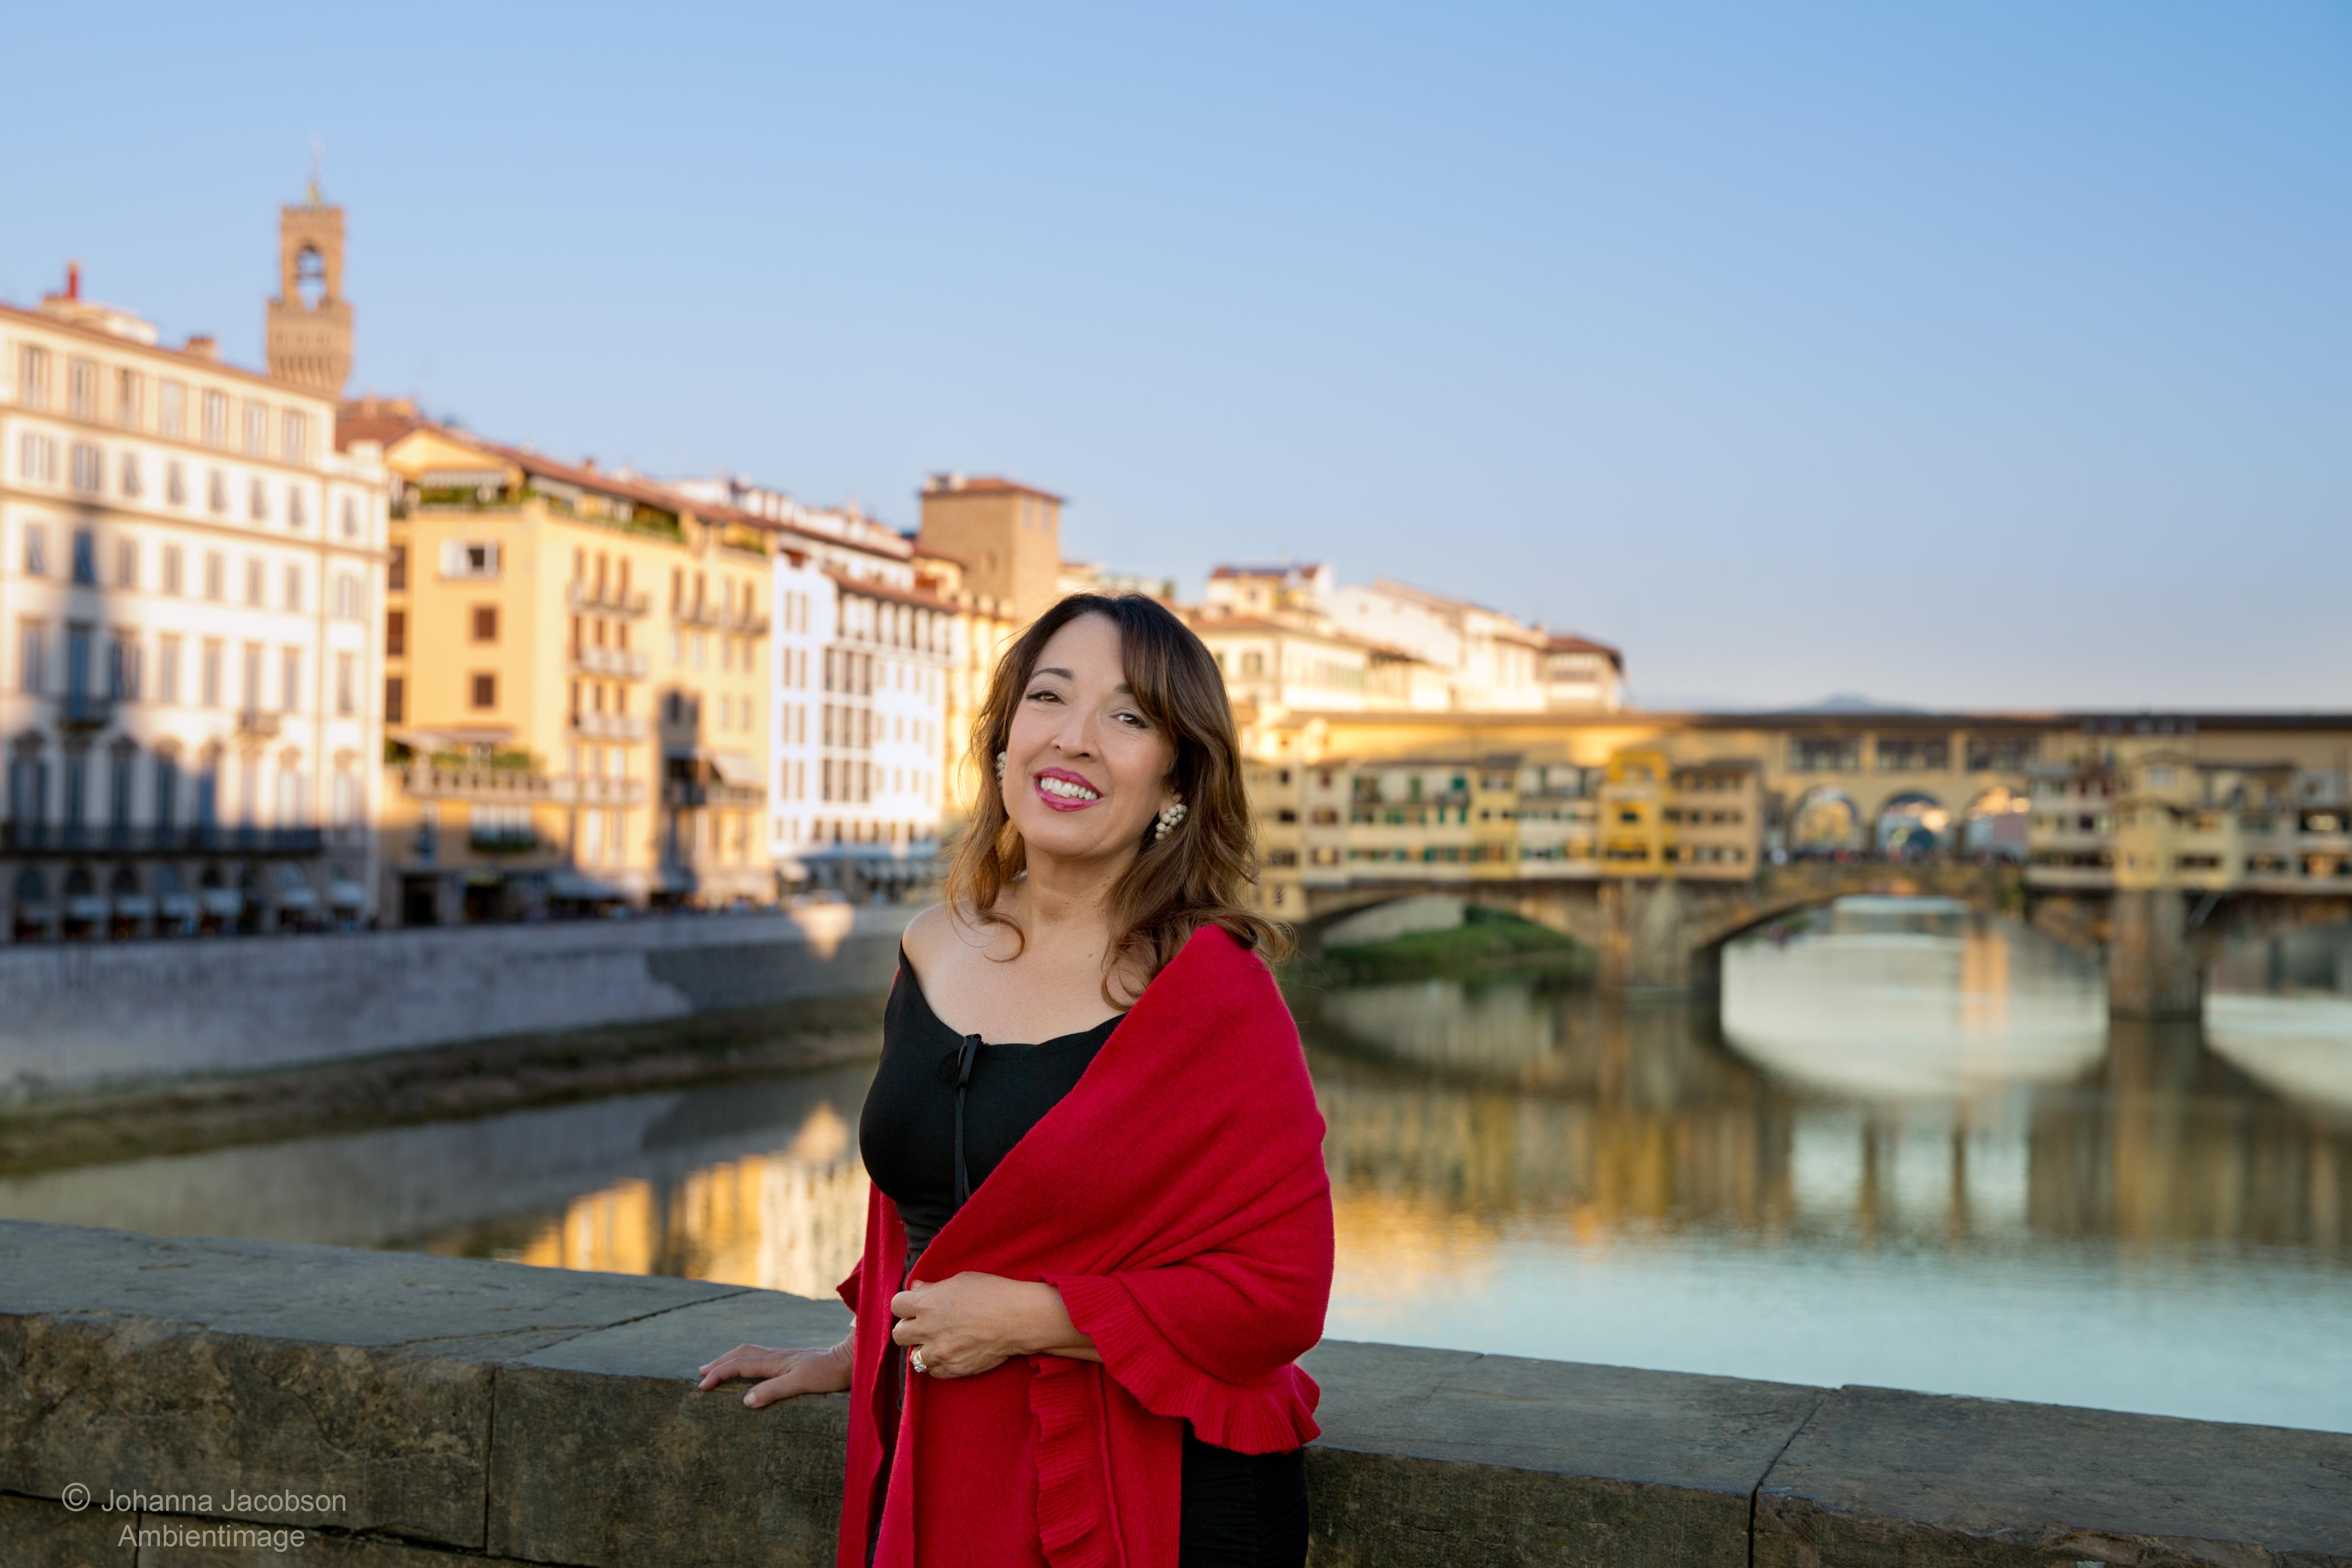 Interview withSusan Van Allen about Italy